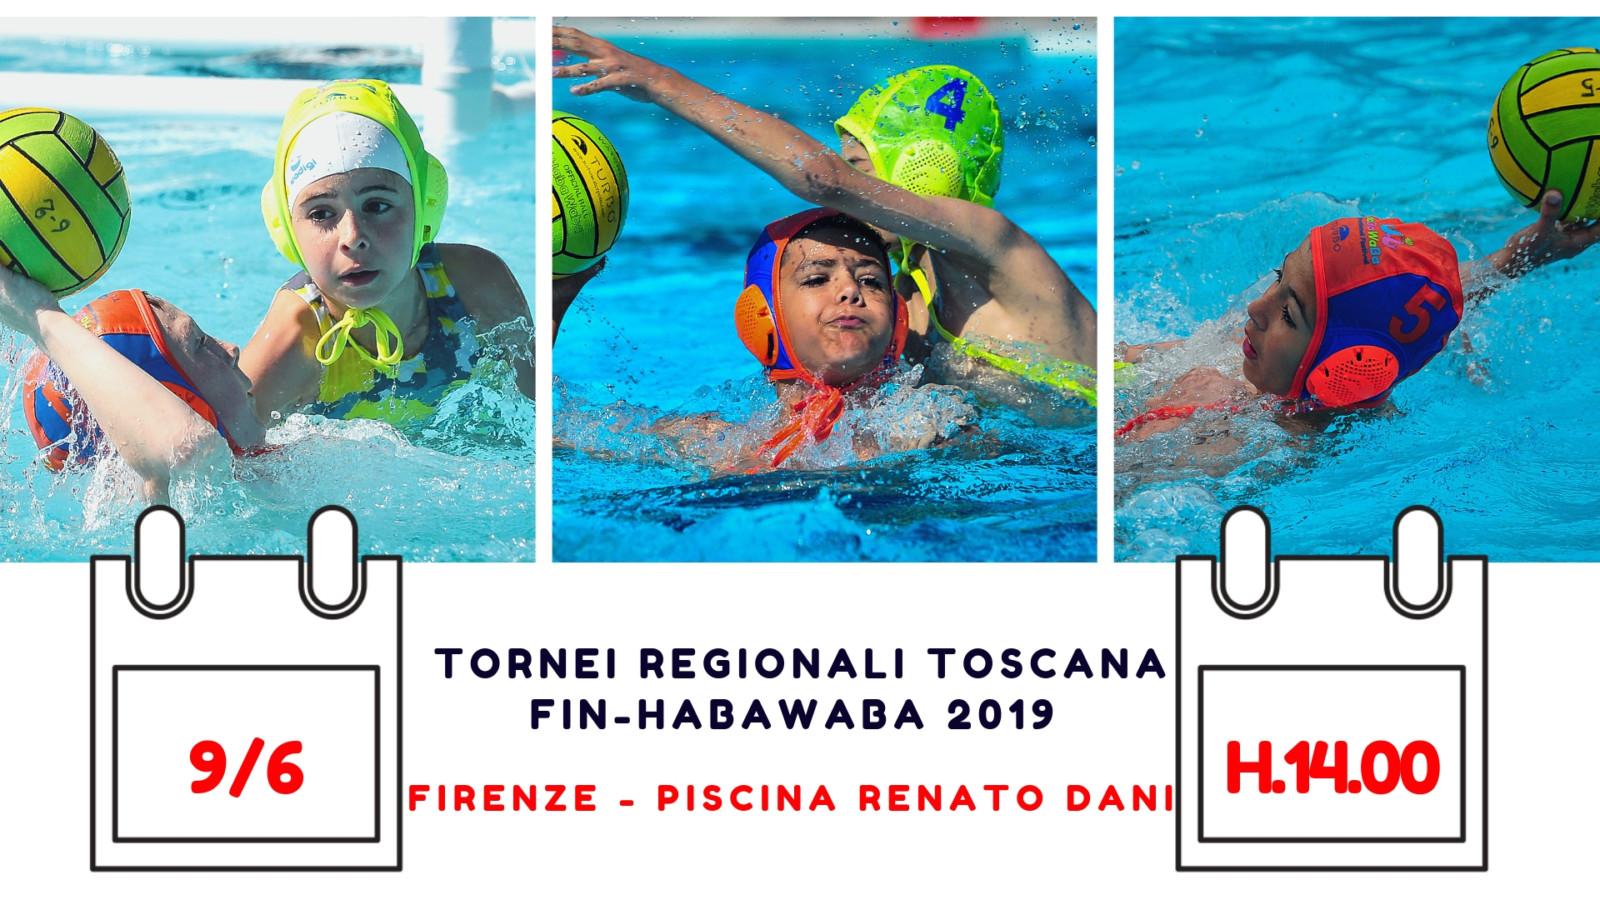 Copy of tornei regionali TOSCANA fin-habawaba 2019 day 4